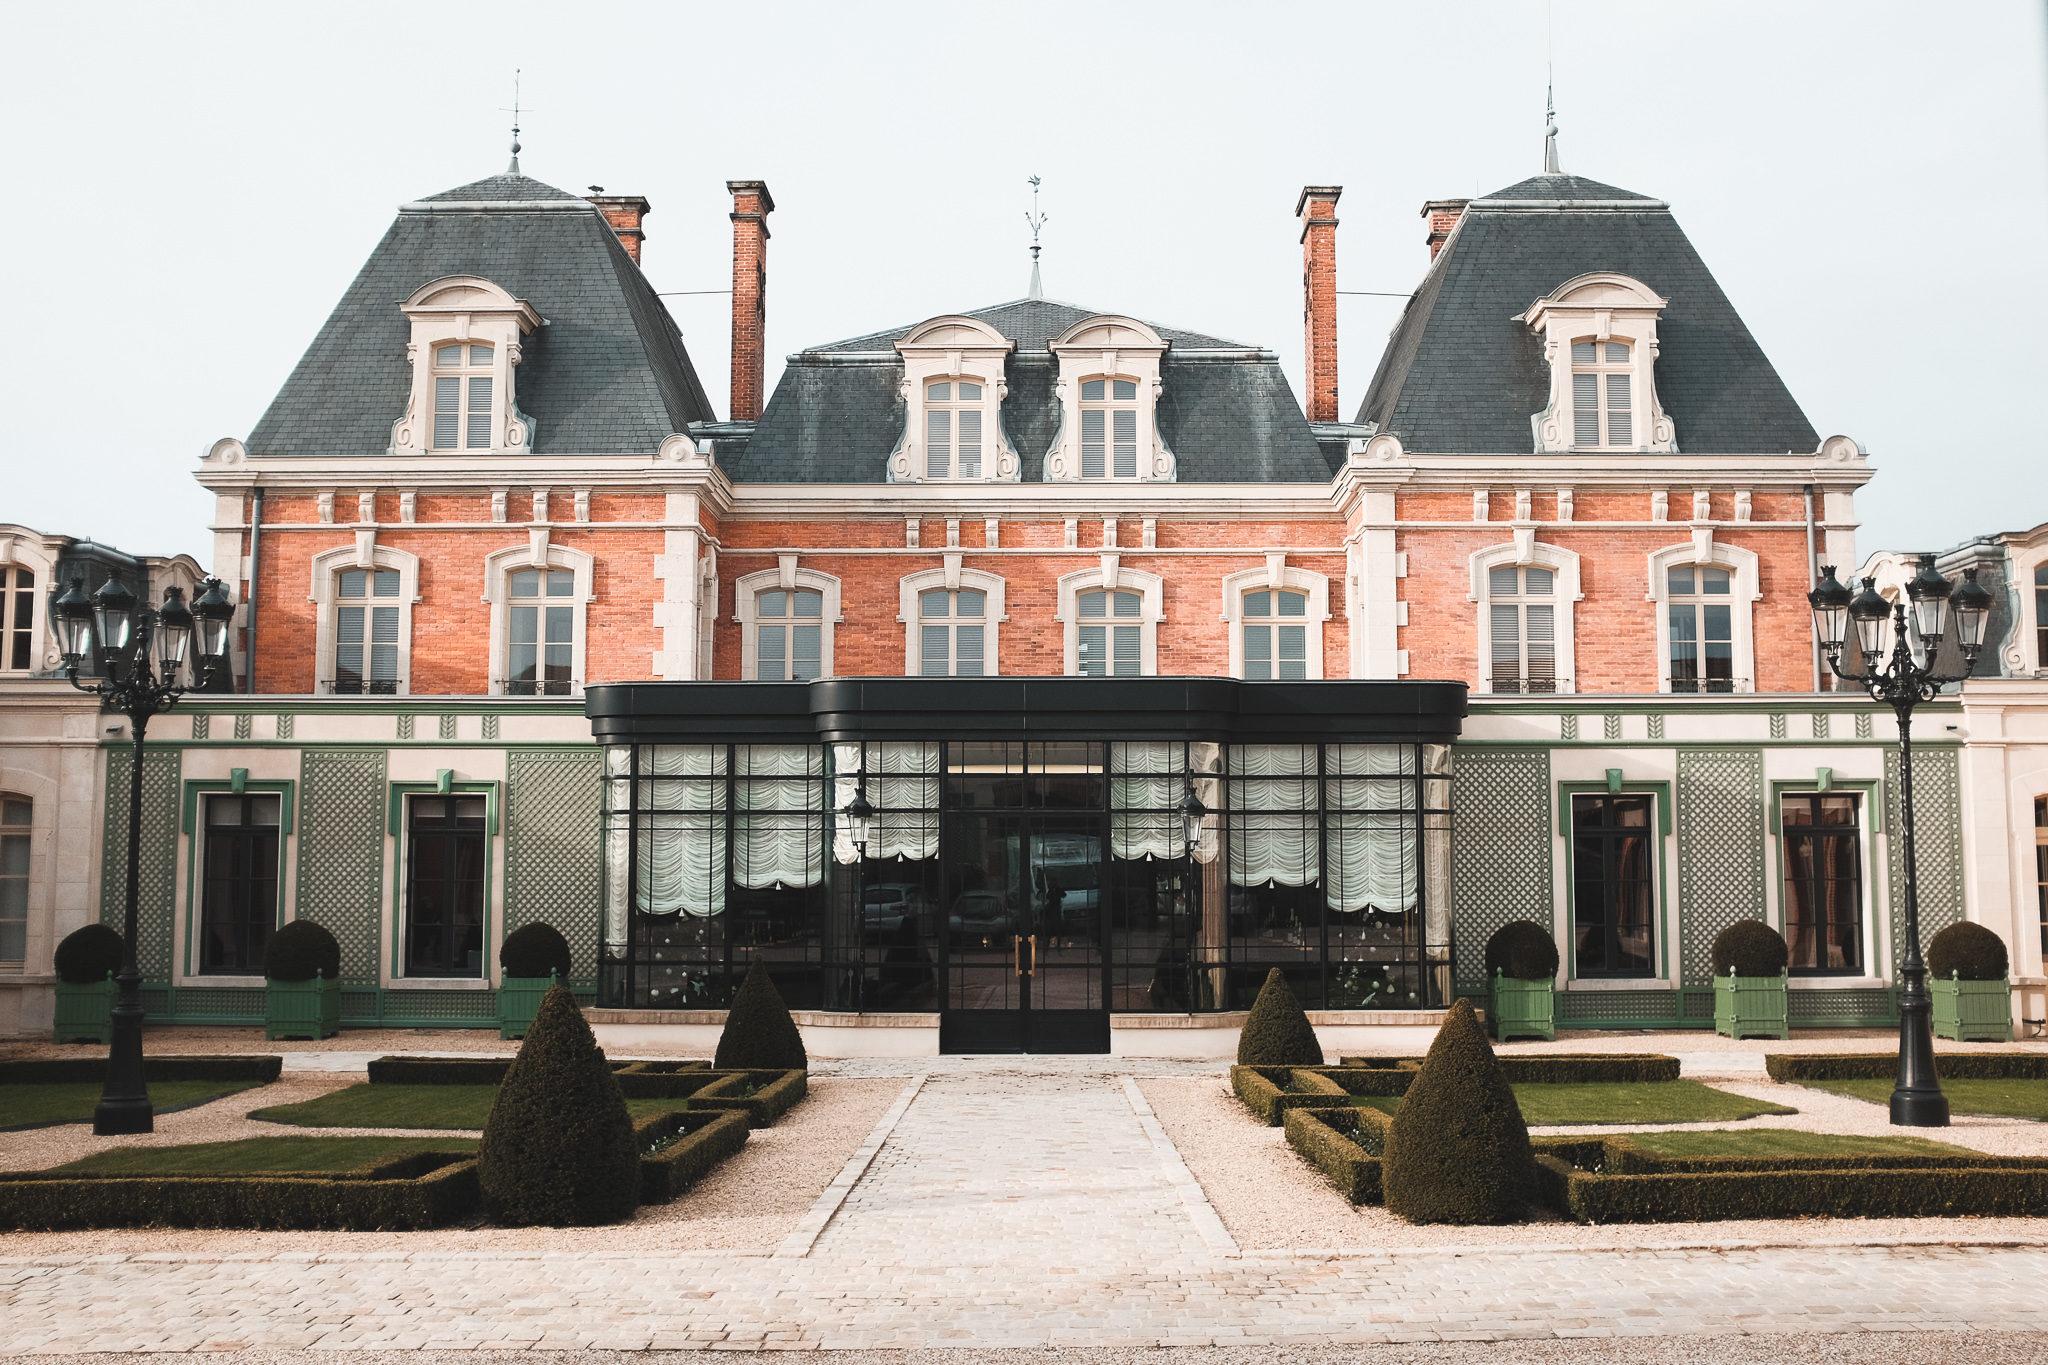 Maison Pol Roger Épernay